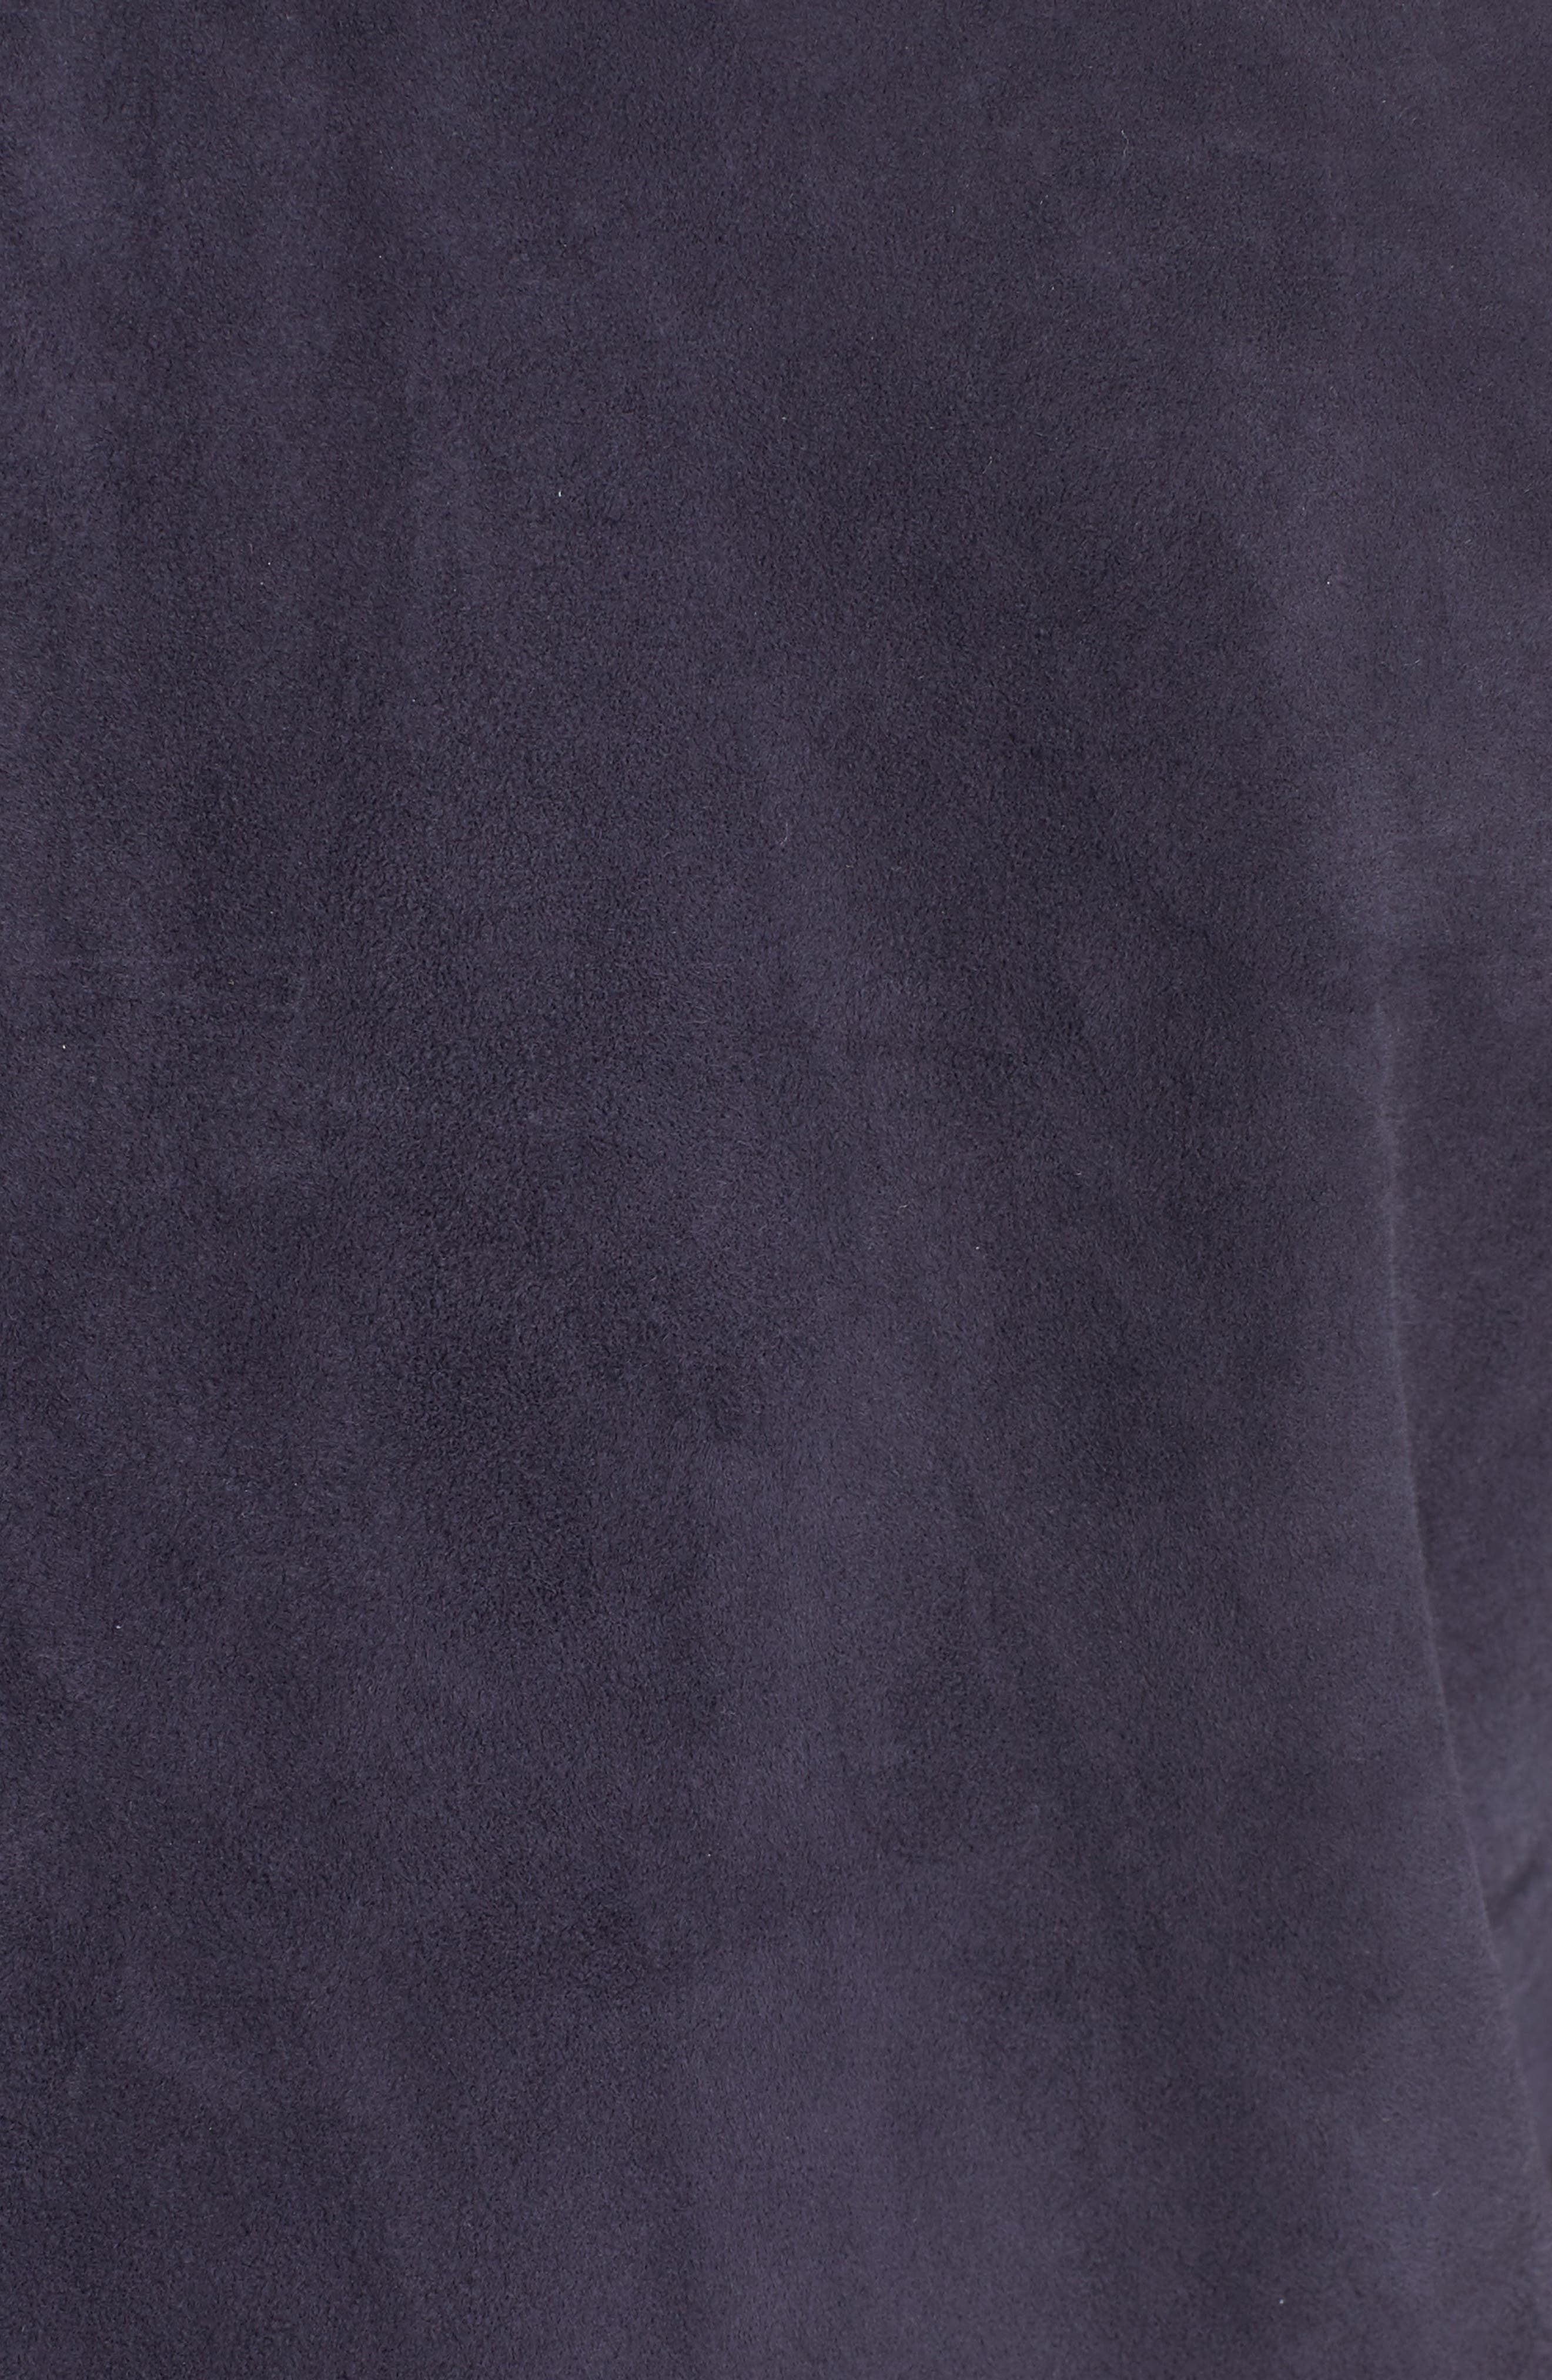 Suede Jacket,                             Alternate thumbnail 6, color,                             400